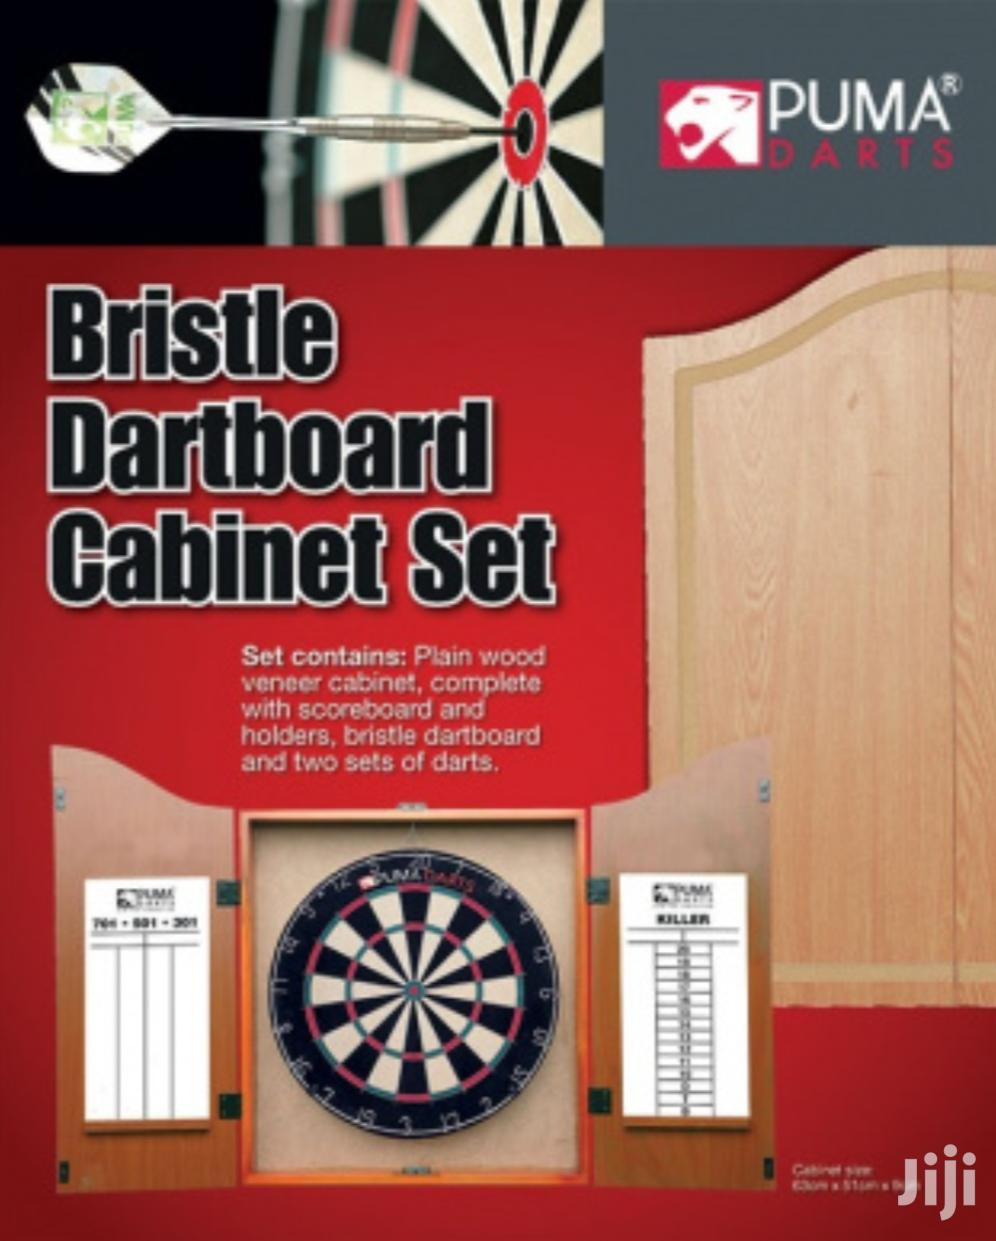 Original Puma Darts Stadium Bristle Dartboard Cabinet Set | Books & Games for sale in Kampala, Central Region, Uganda